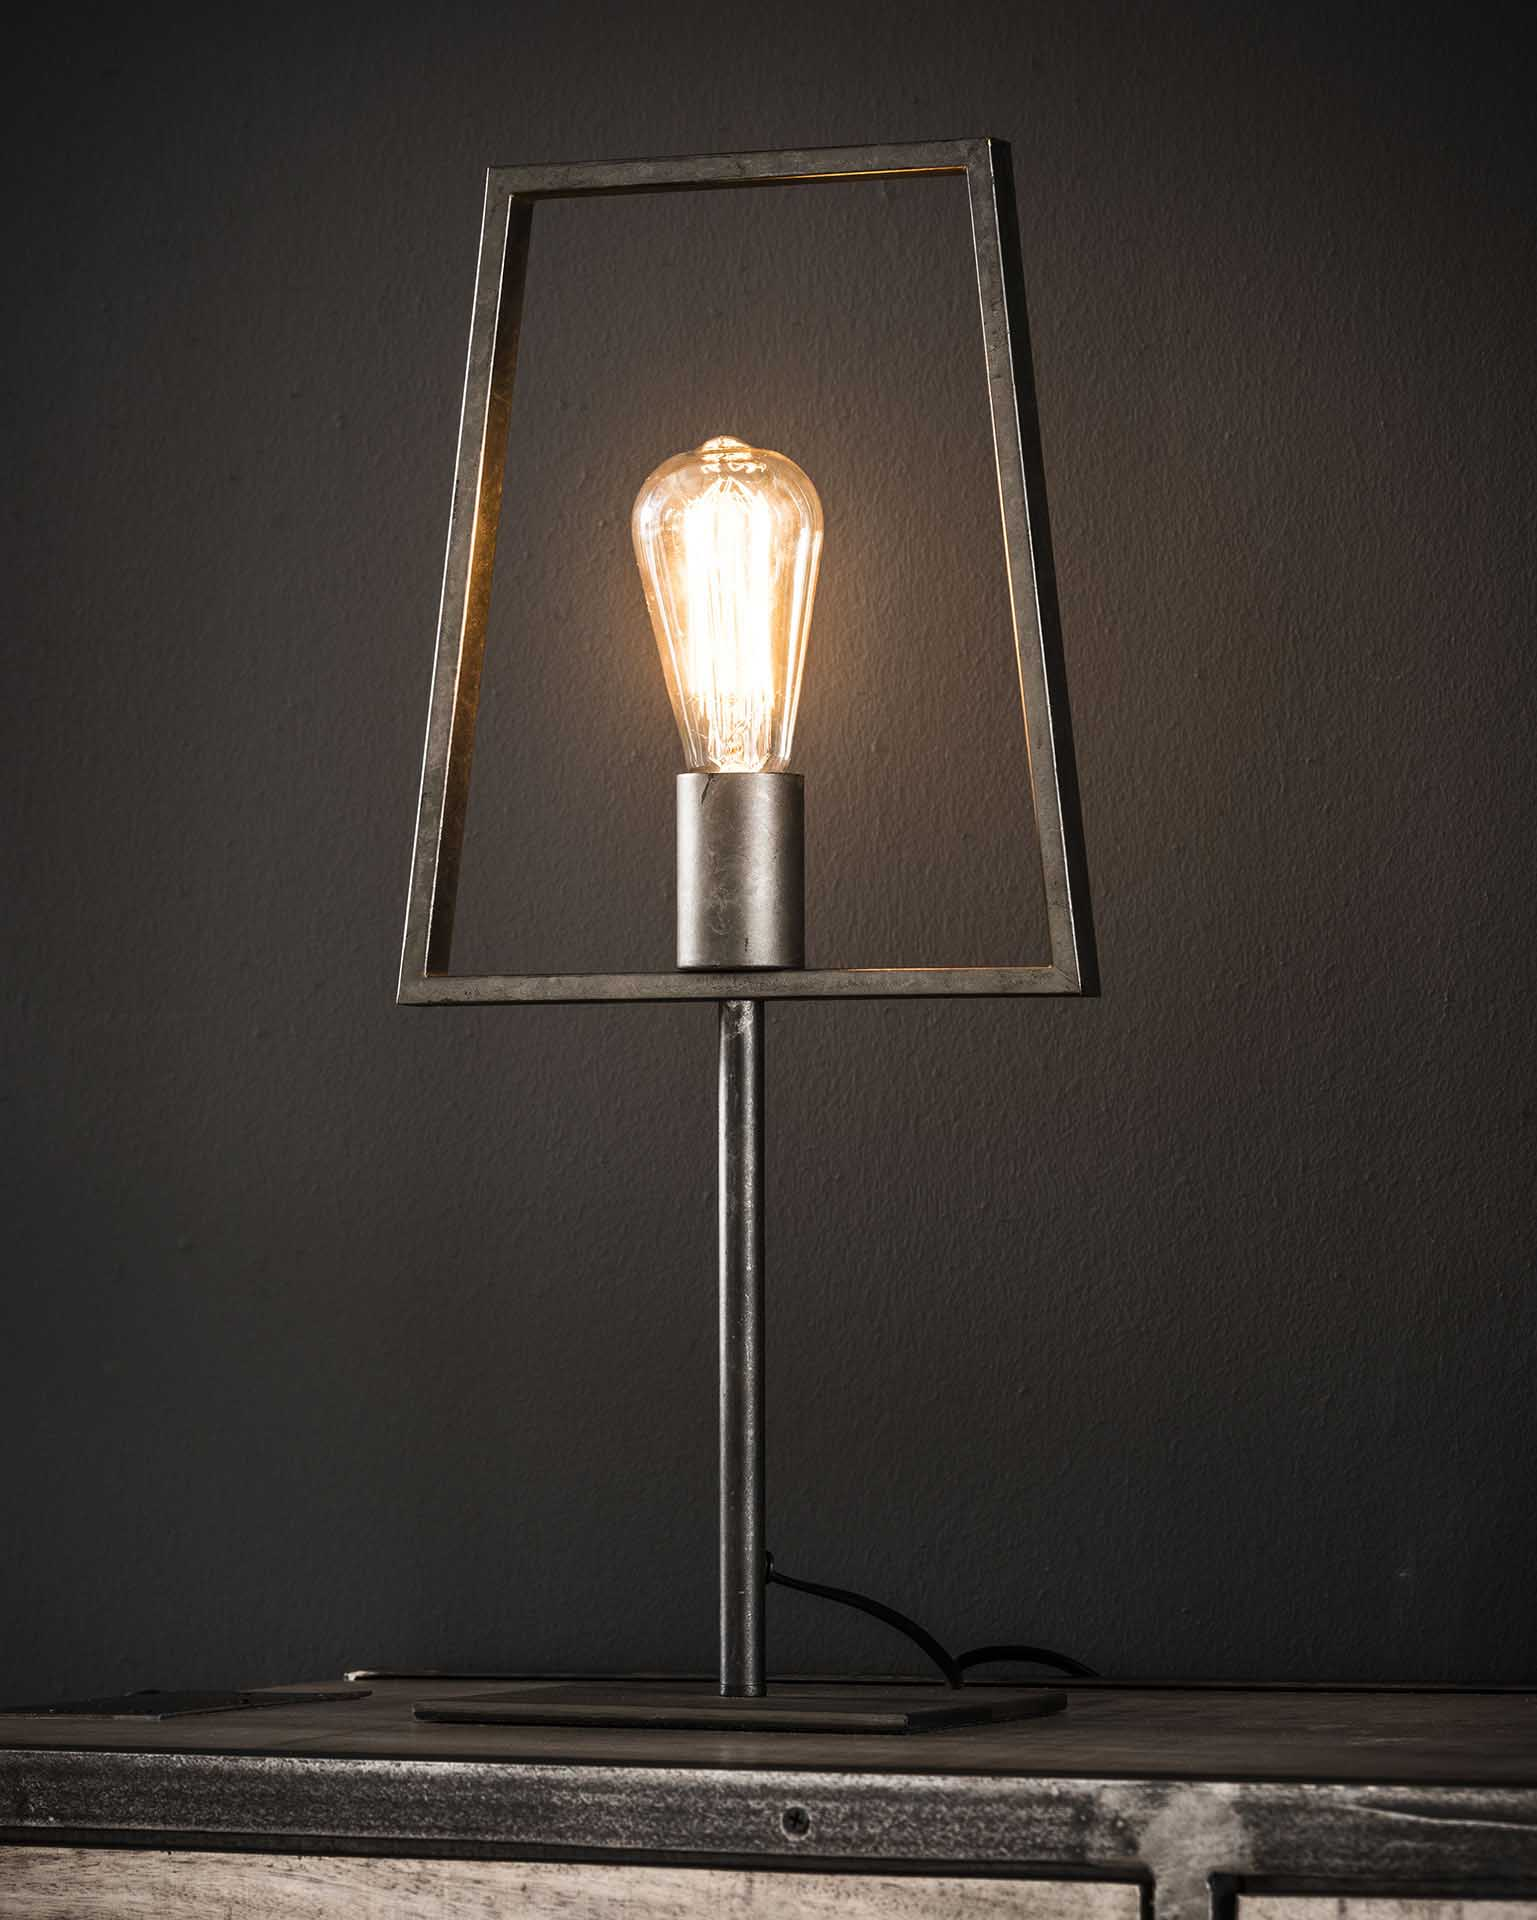 Tafellamp 'Minimal' 1-lamps Verlichting | Tafellampen kopen